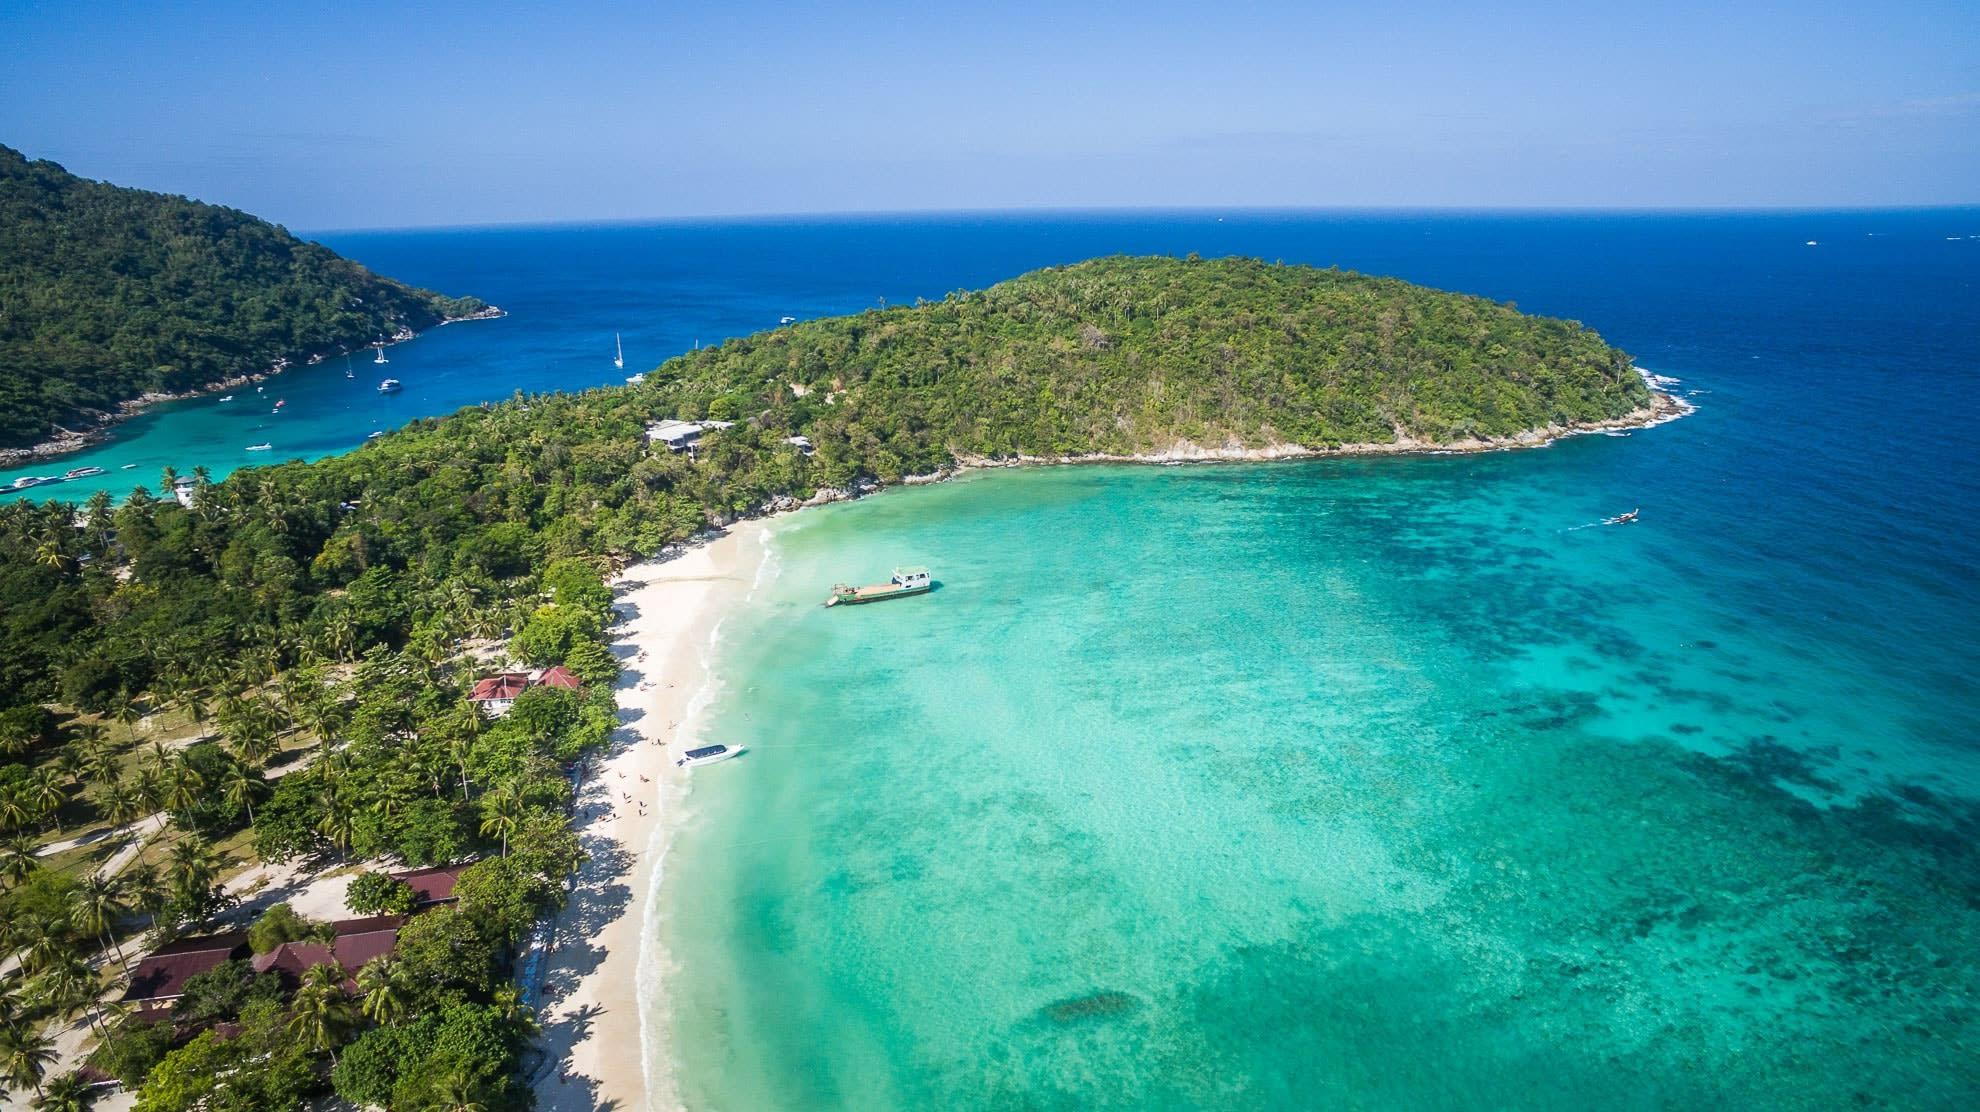 Koh Racha Emperor Islands Phuket